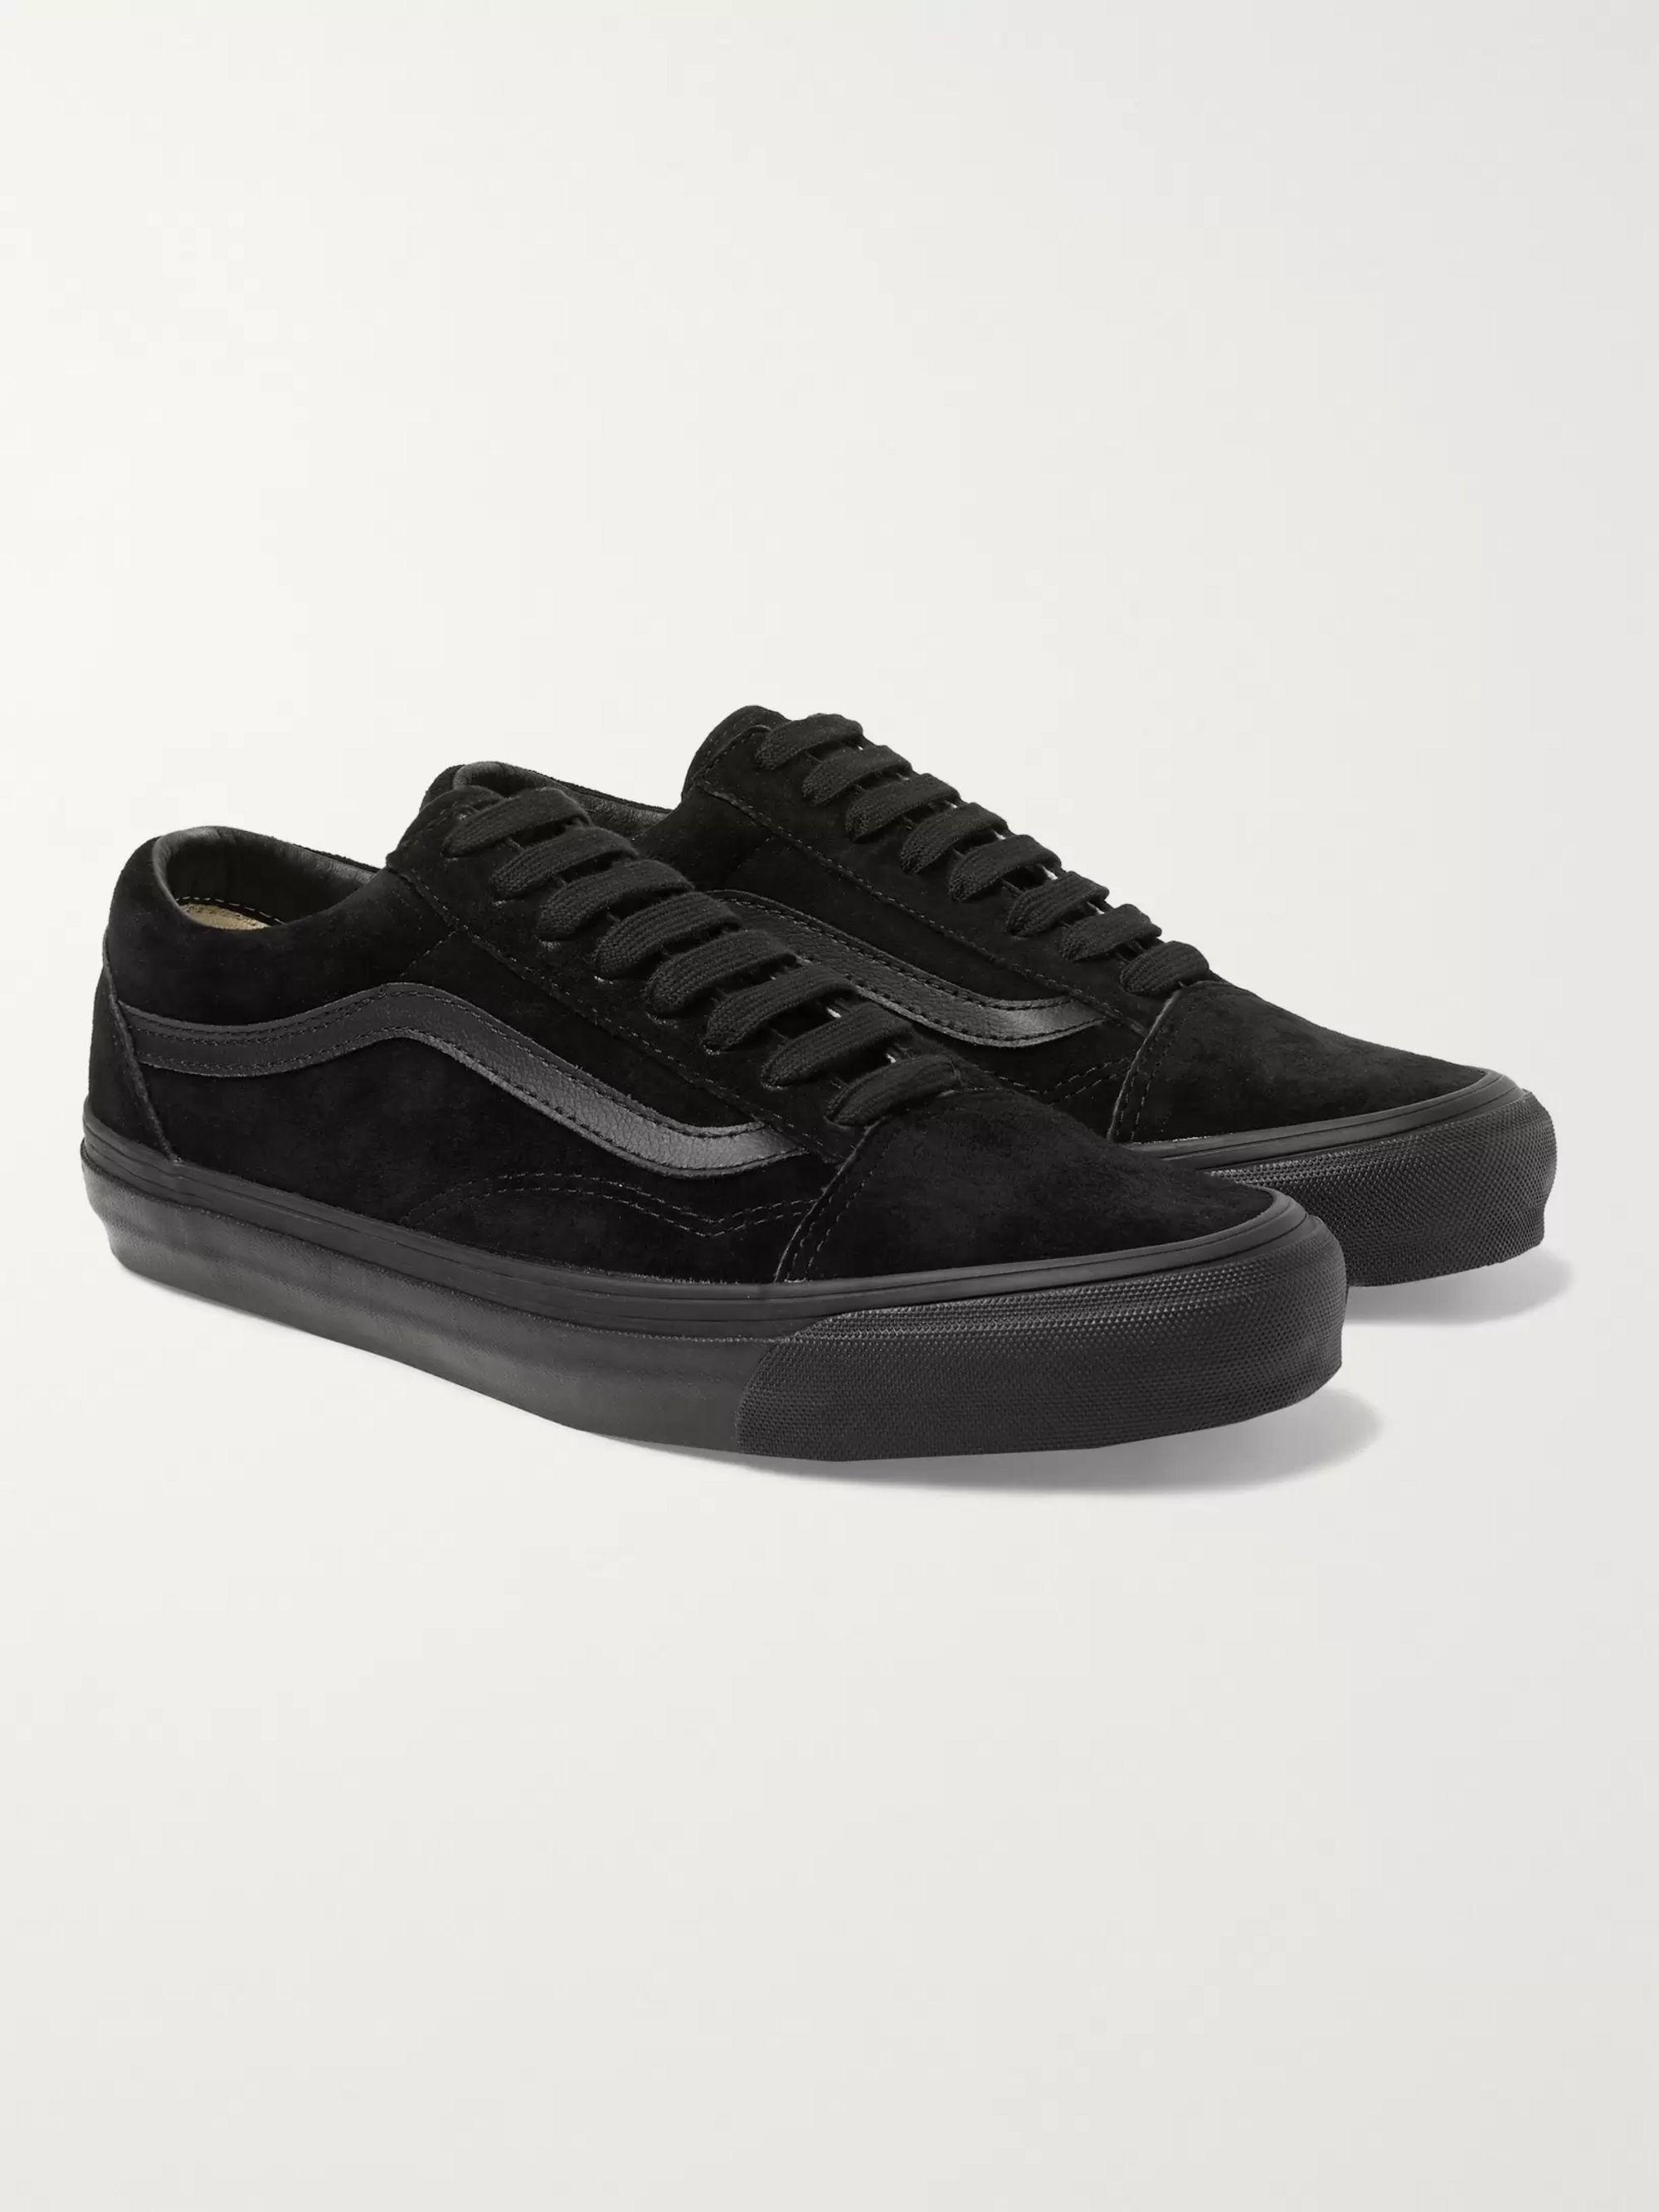 OG Old Skool LX Leather Trimmed Suede Sneakers